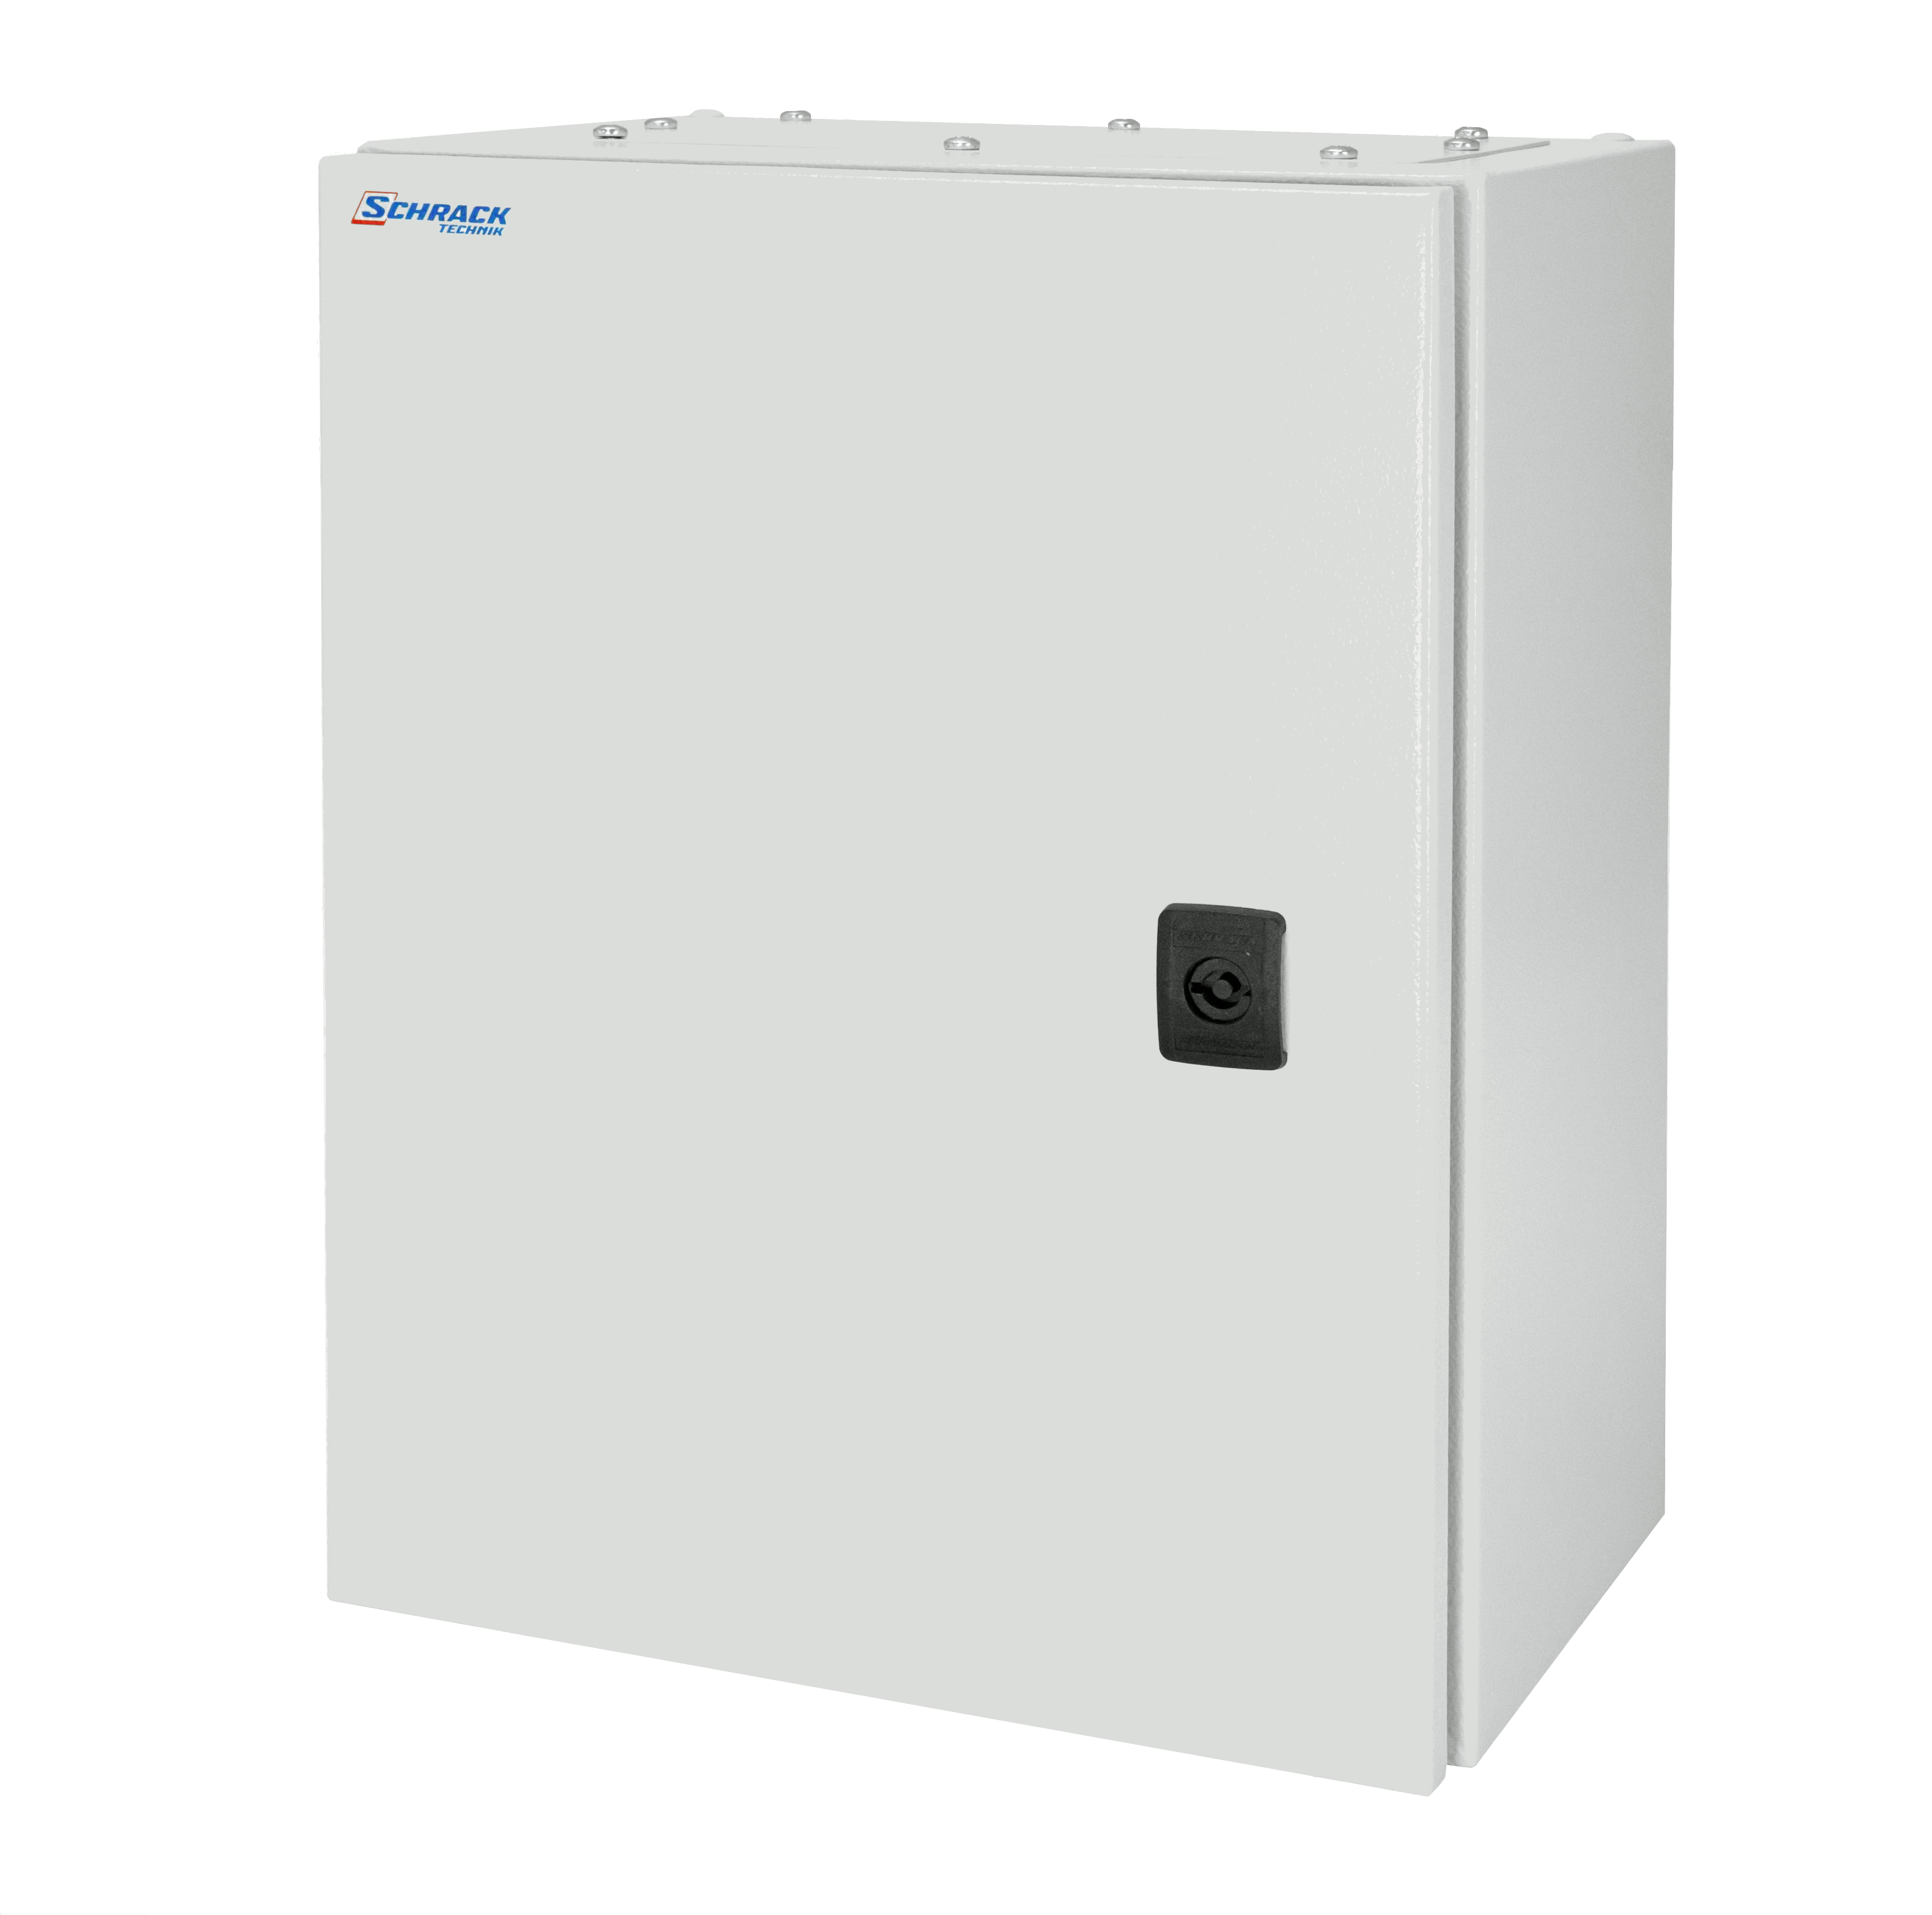 1 Stk Wandschrank Mono IP66 H=1000 B=800 T=260 Stahlblech WSM1008260